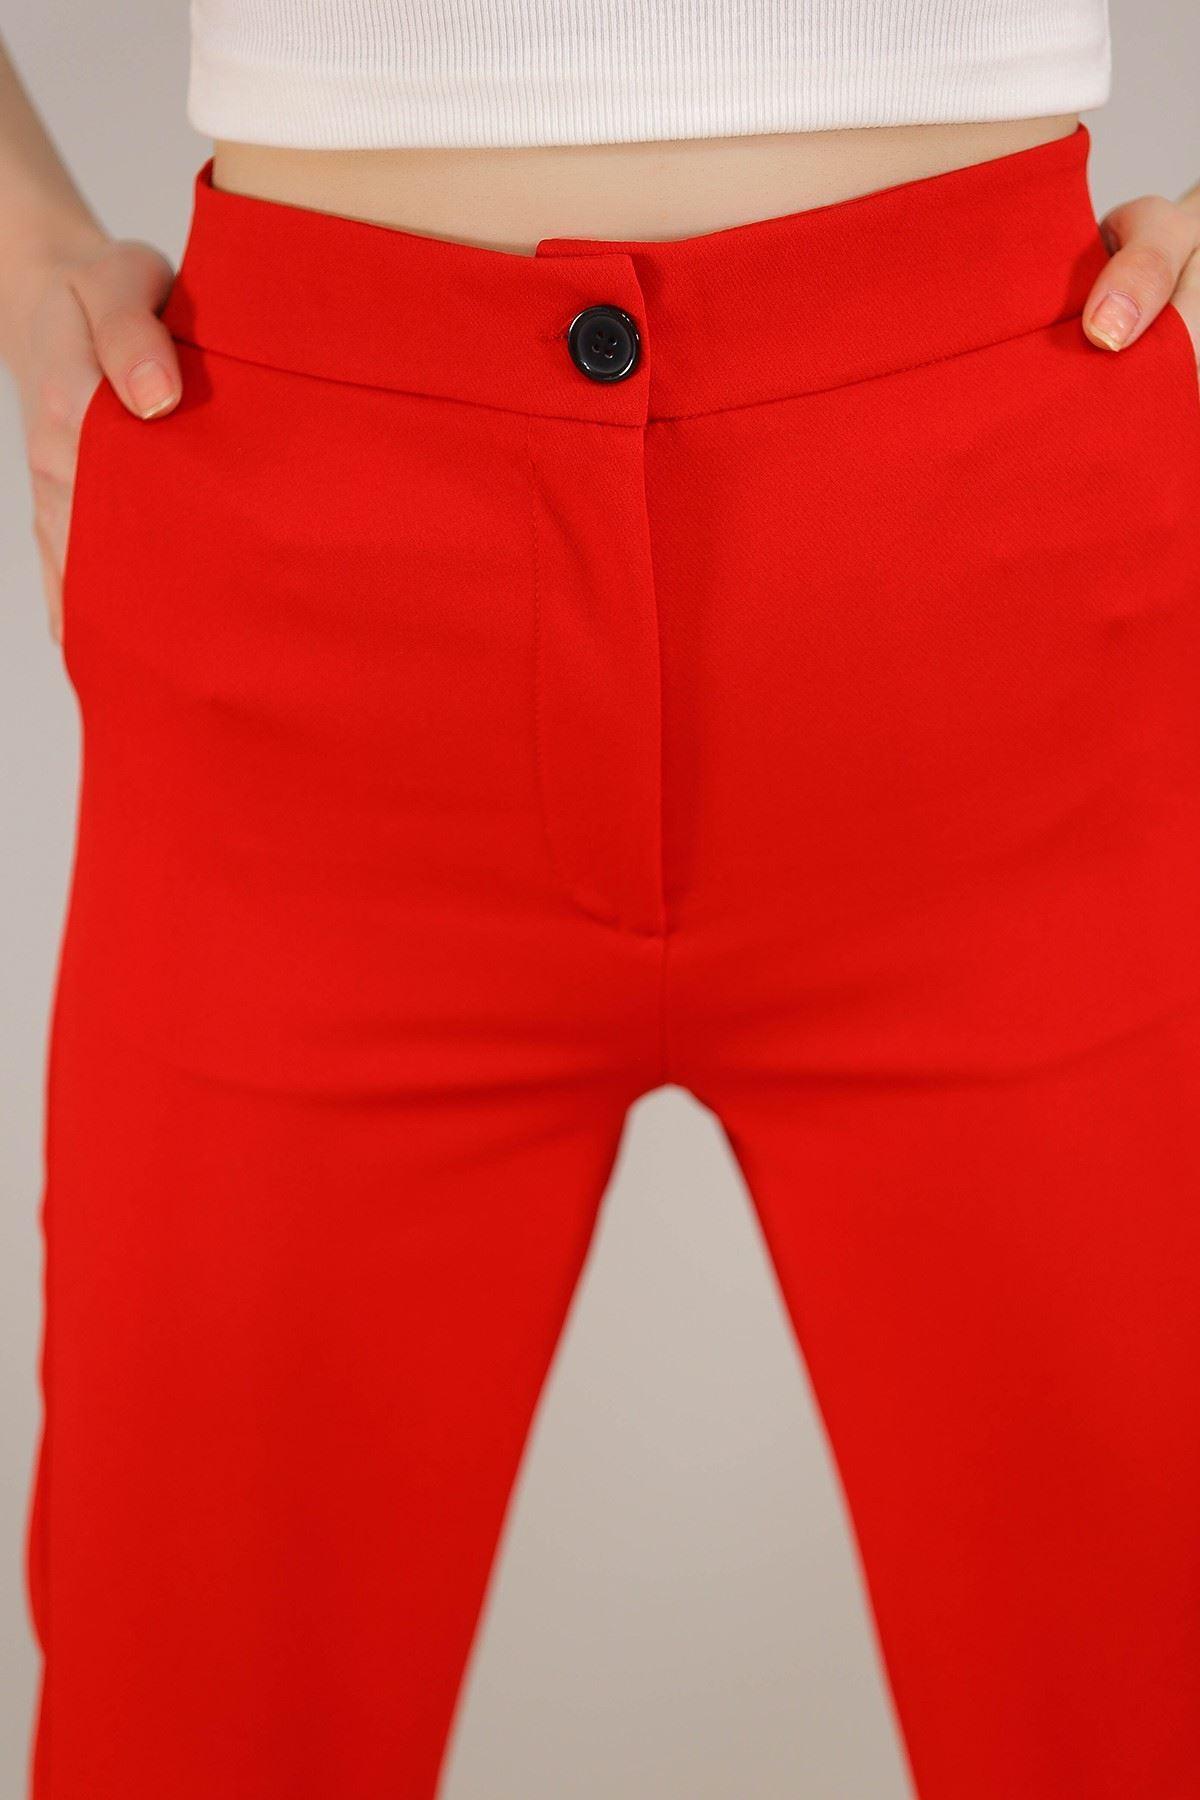 Lastikli Pantolon Kırmızı - 3672.222.